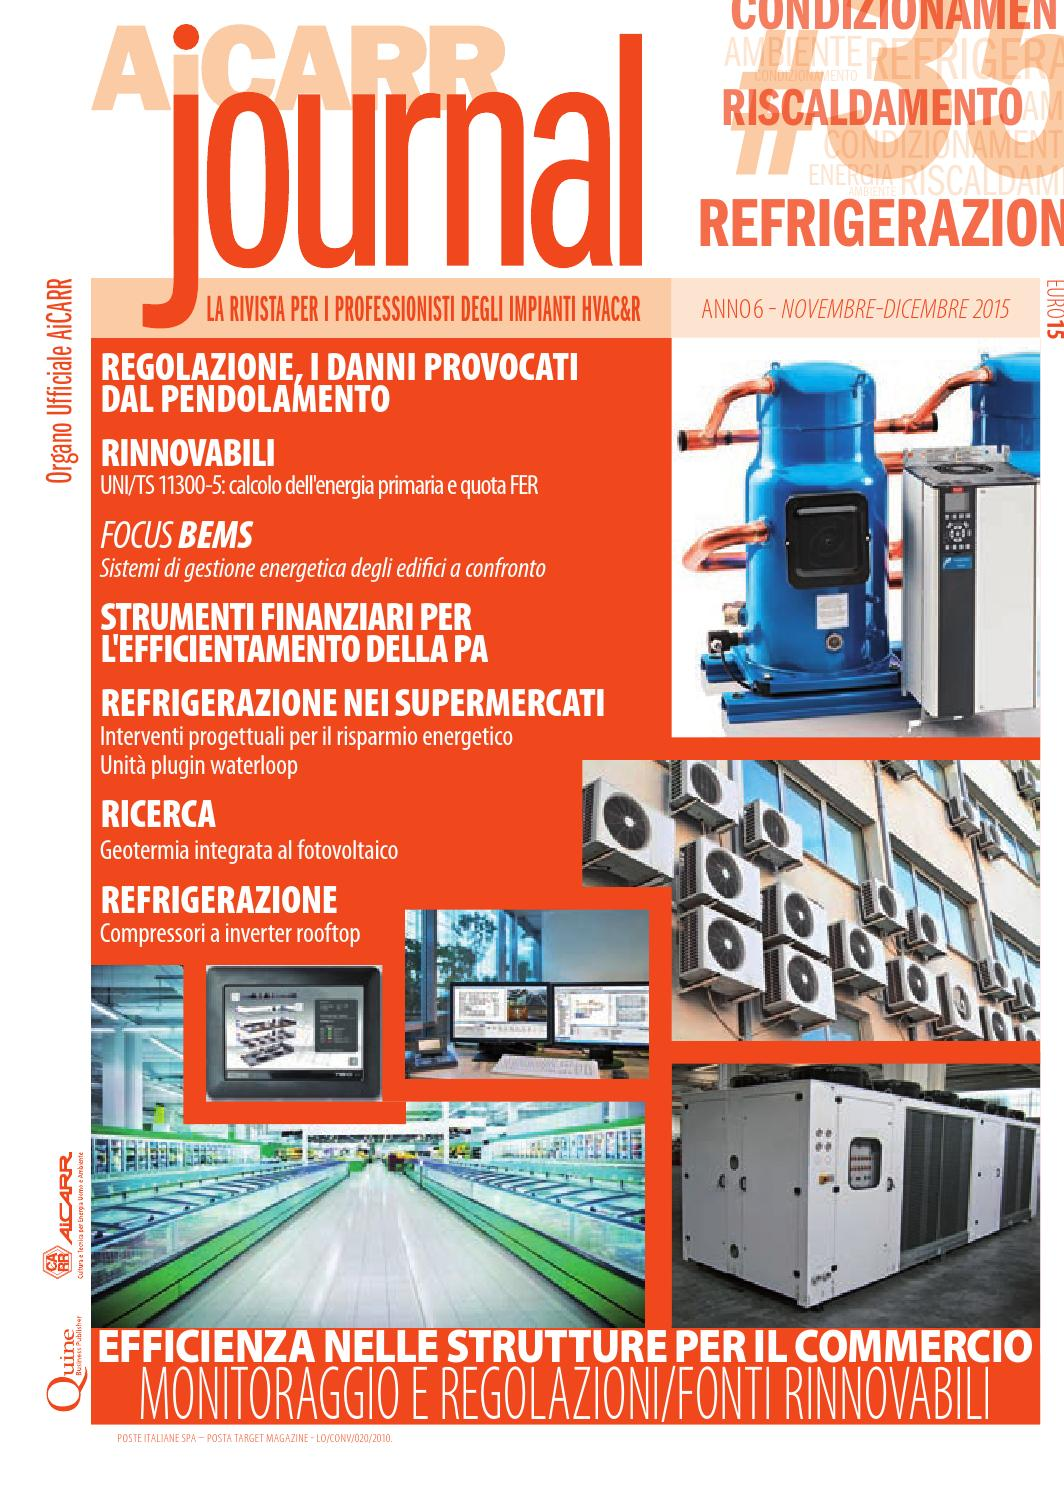 AiCARR Journal  35 - Efficienza energetica nelle strutture per il commercio  by Quine Business Publisher - issuu fe48cb38d80